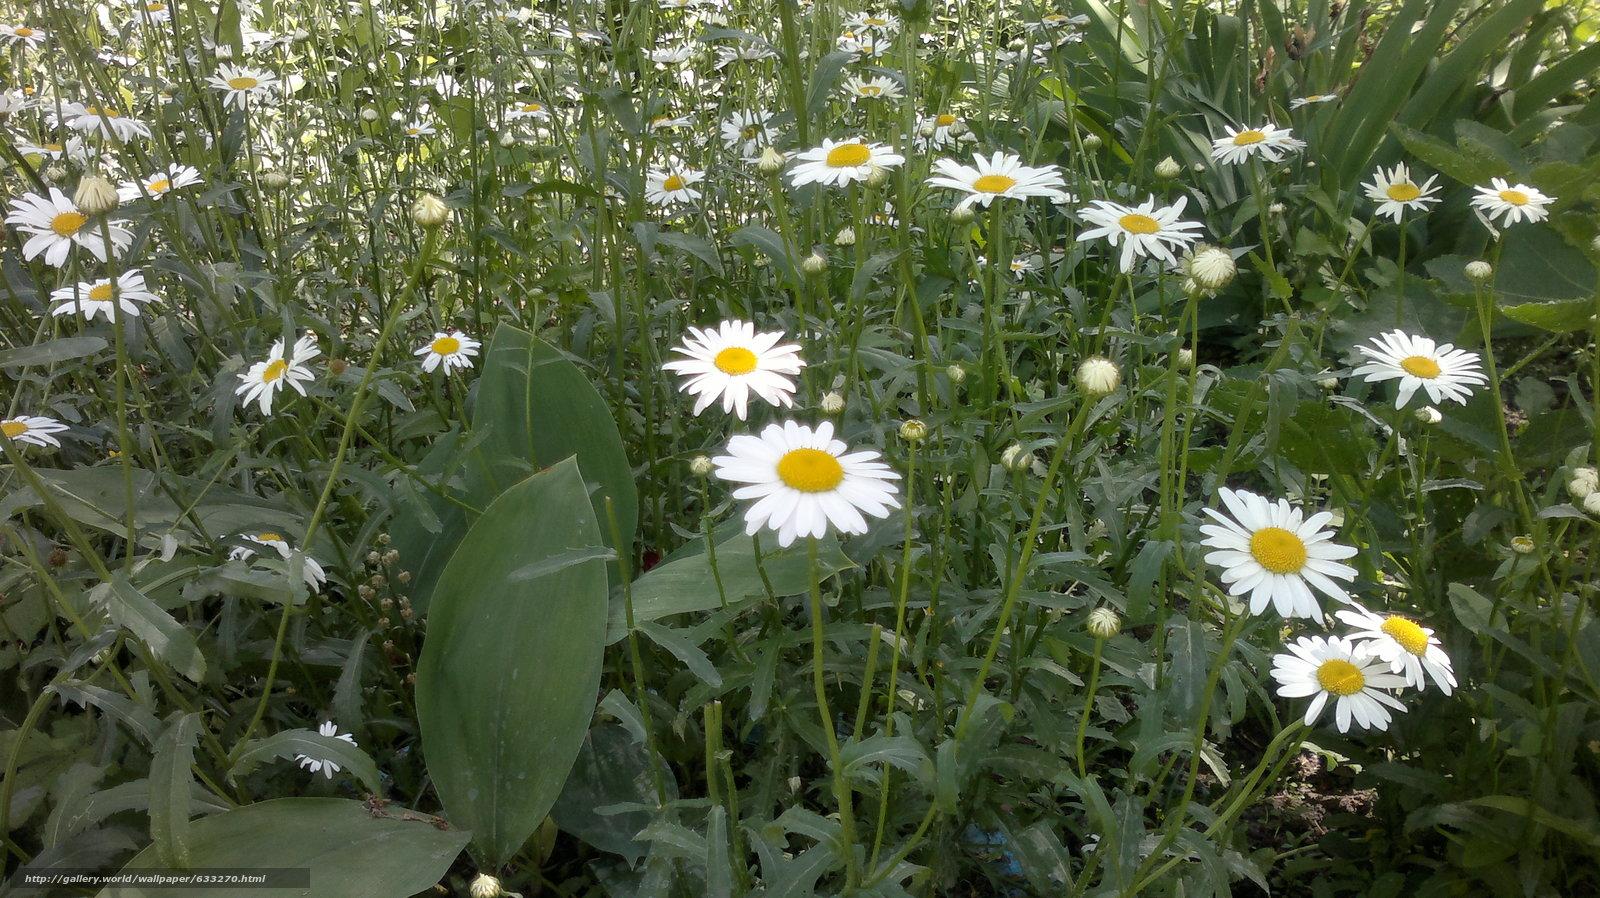 Tlcharger fond d 39 ecran fleurs t camomille fonds d for Fond ecran ete fleurs